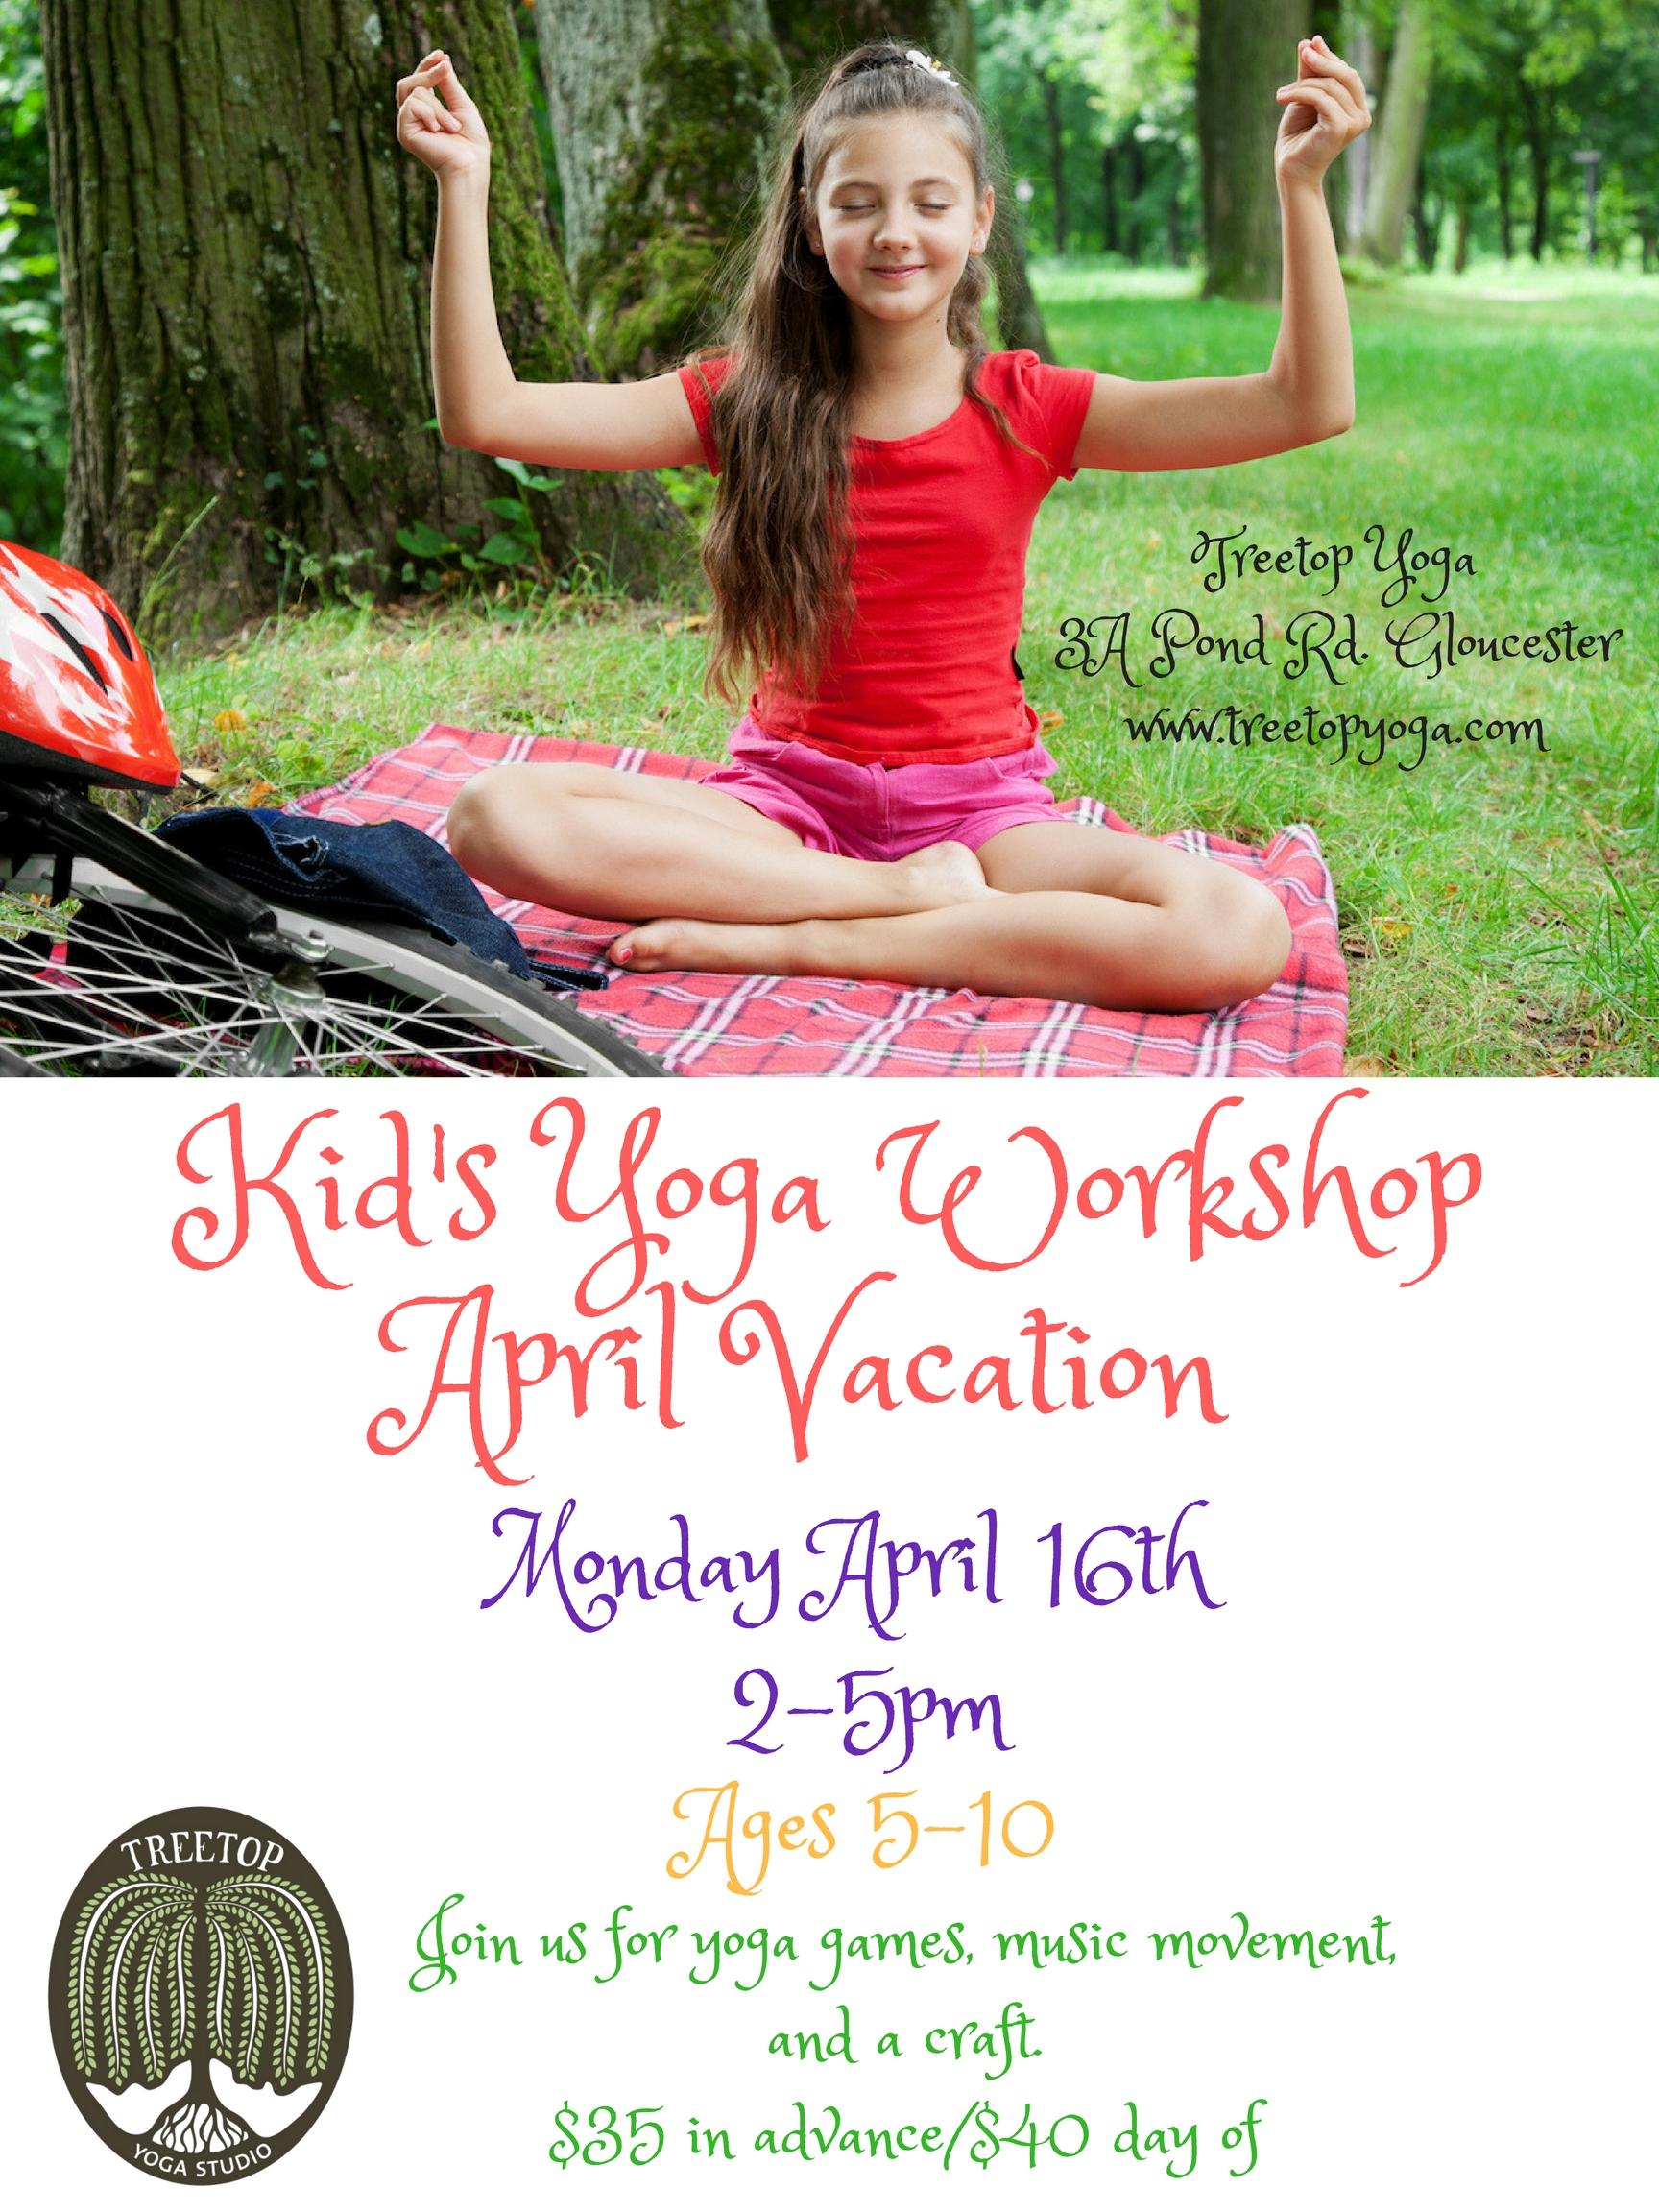 April Vacation Kids Yoga Workshop Cape Ann Wellness